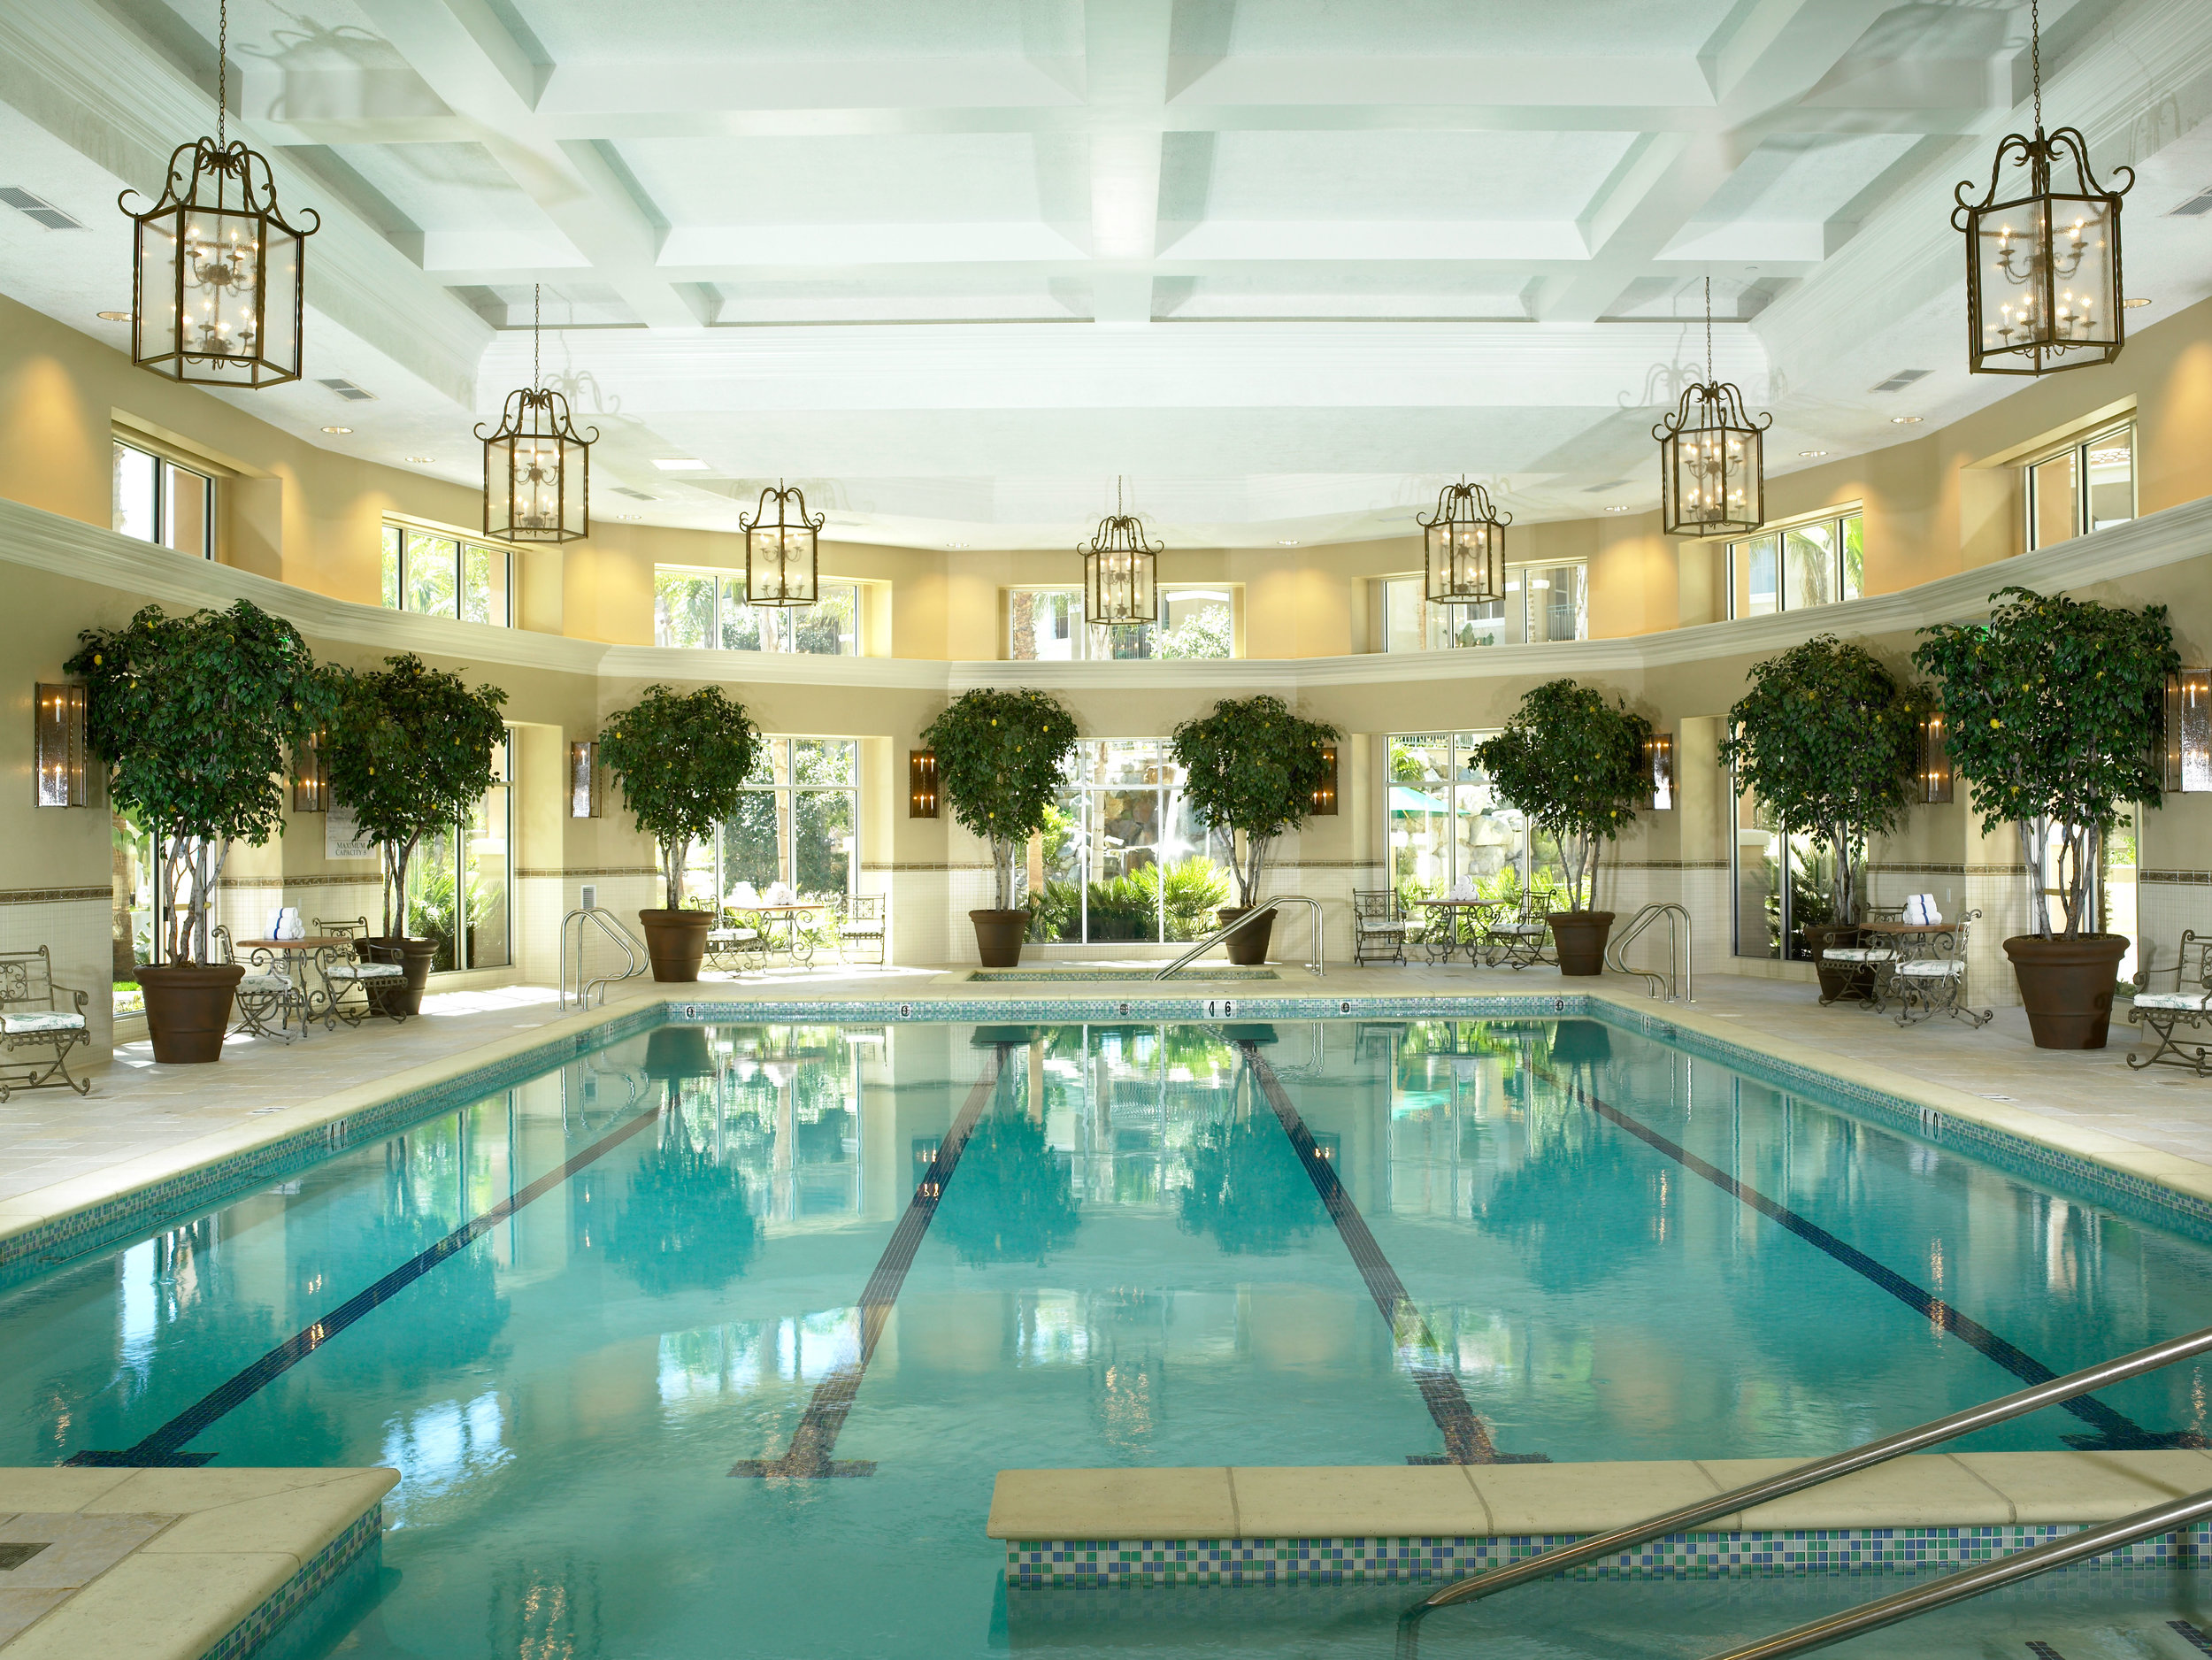 La Costa Glen: Pool